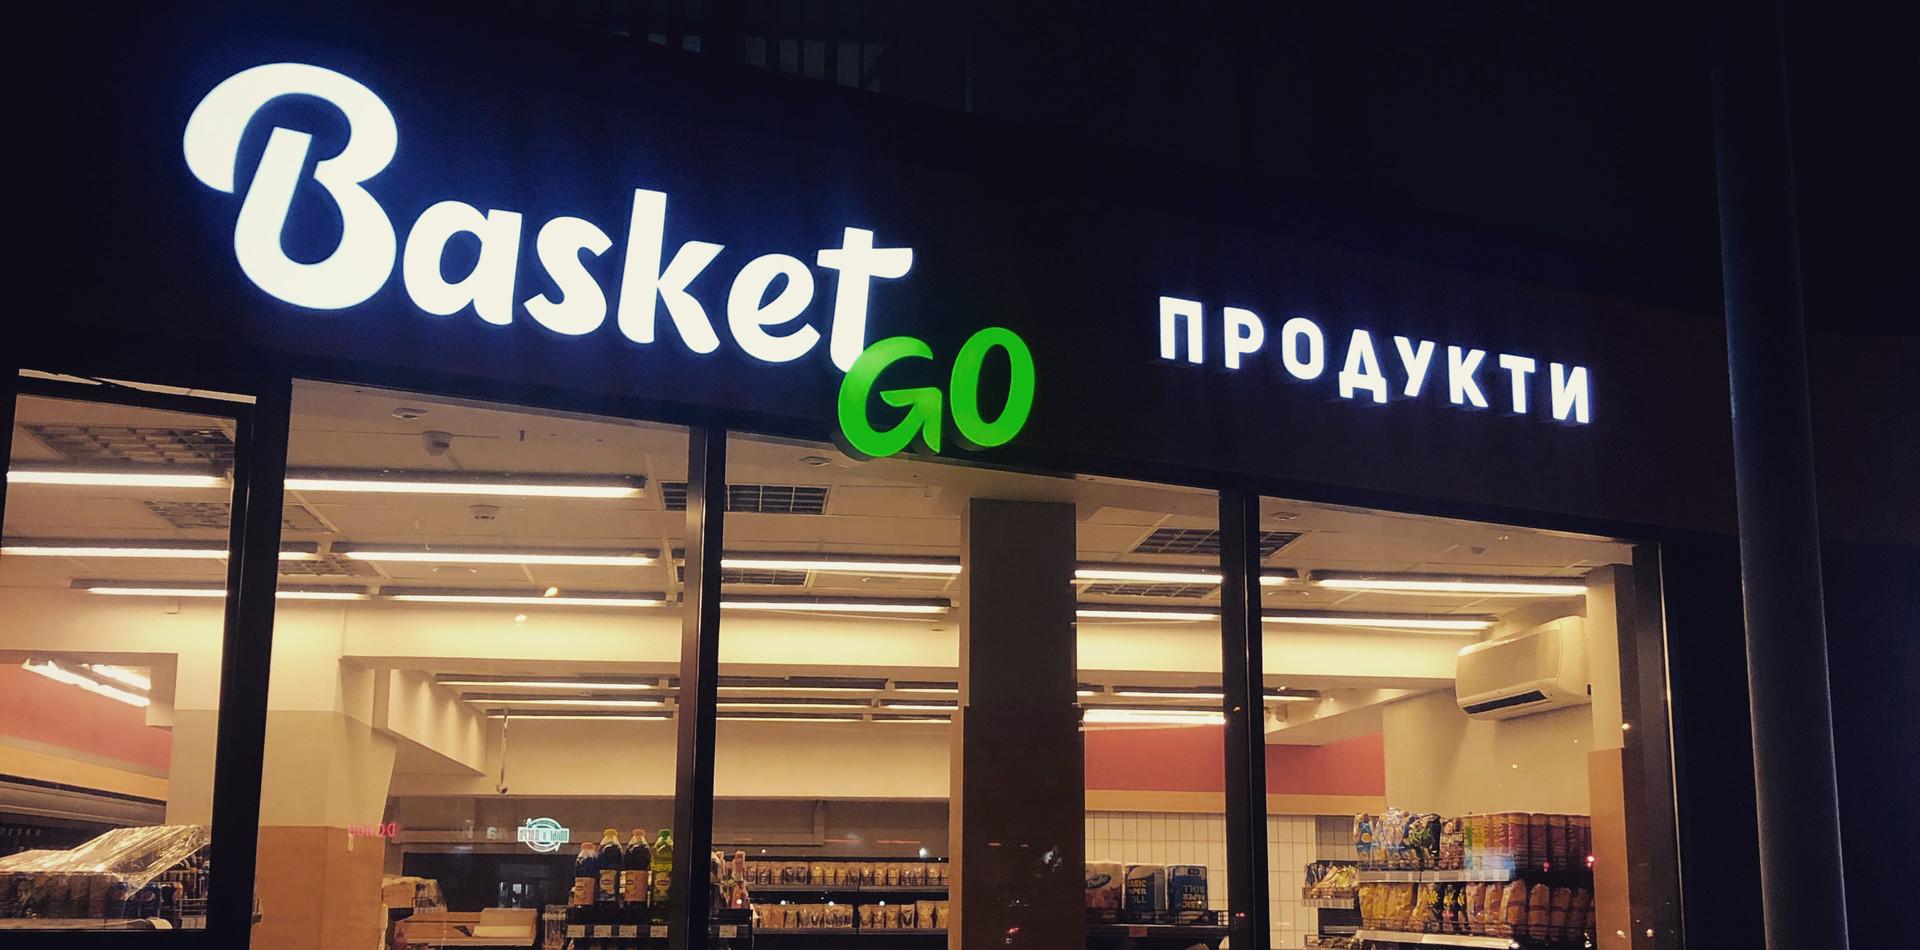 рекламная вывеска для супермаркета.jpg